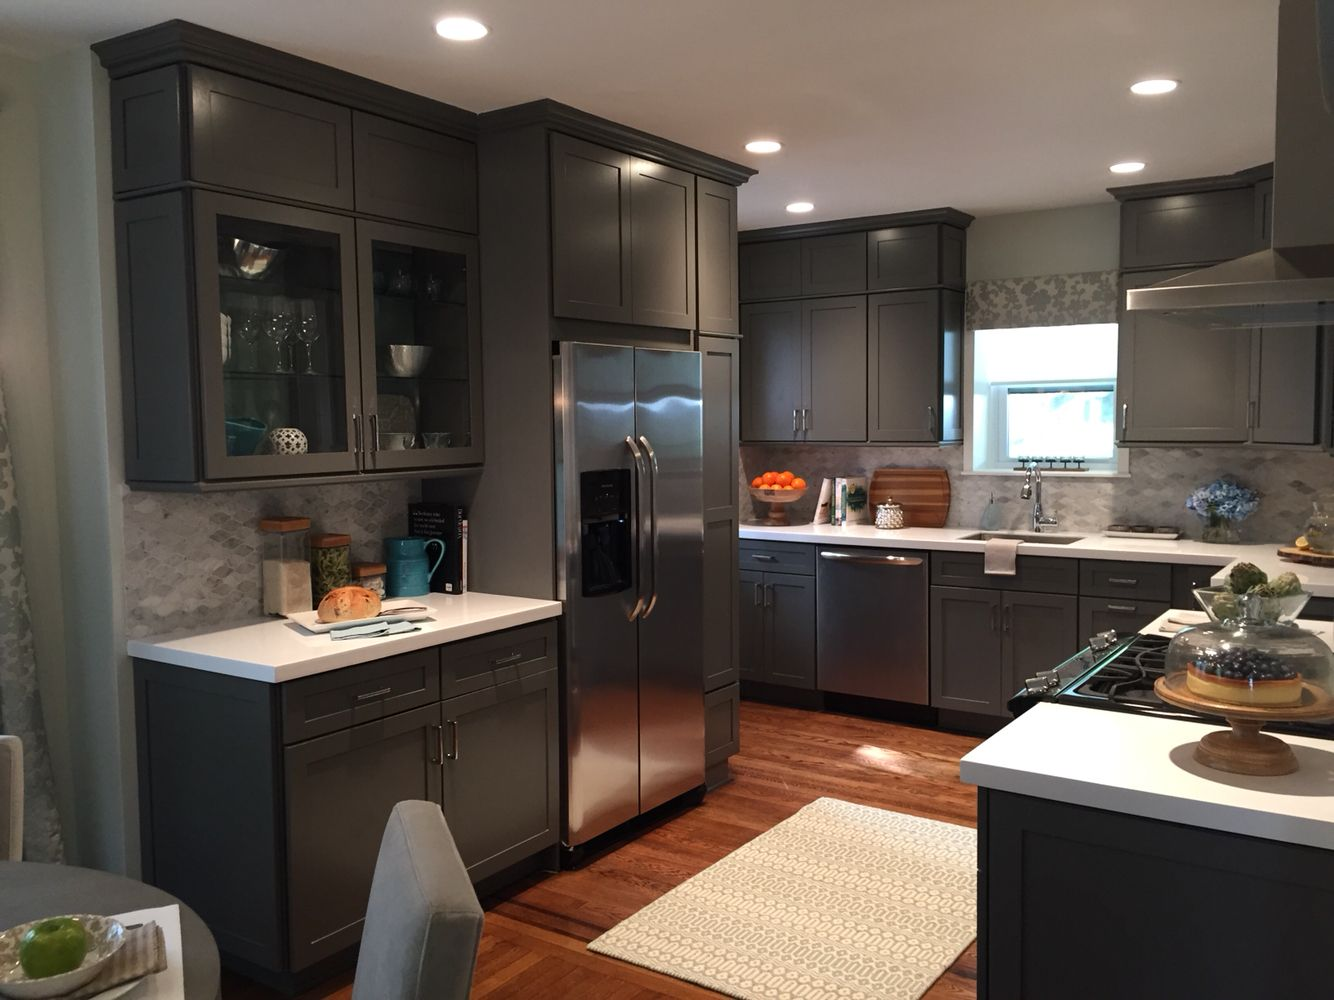 Grey Kitchen Cabinets Carrera Mosaic Backsplash And White Ceaserstone Countertop Full